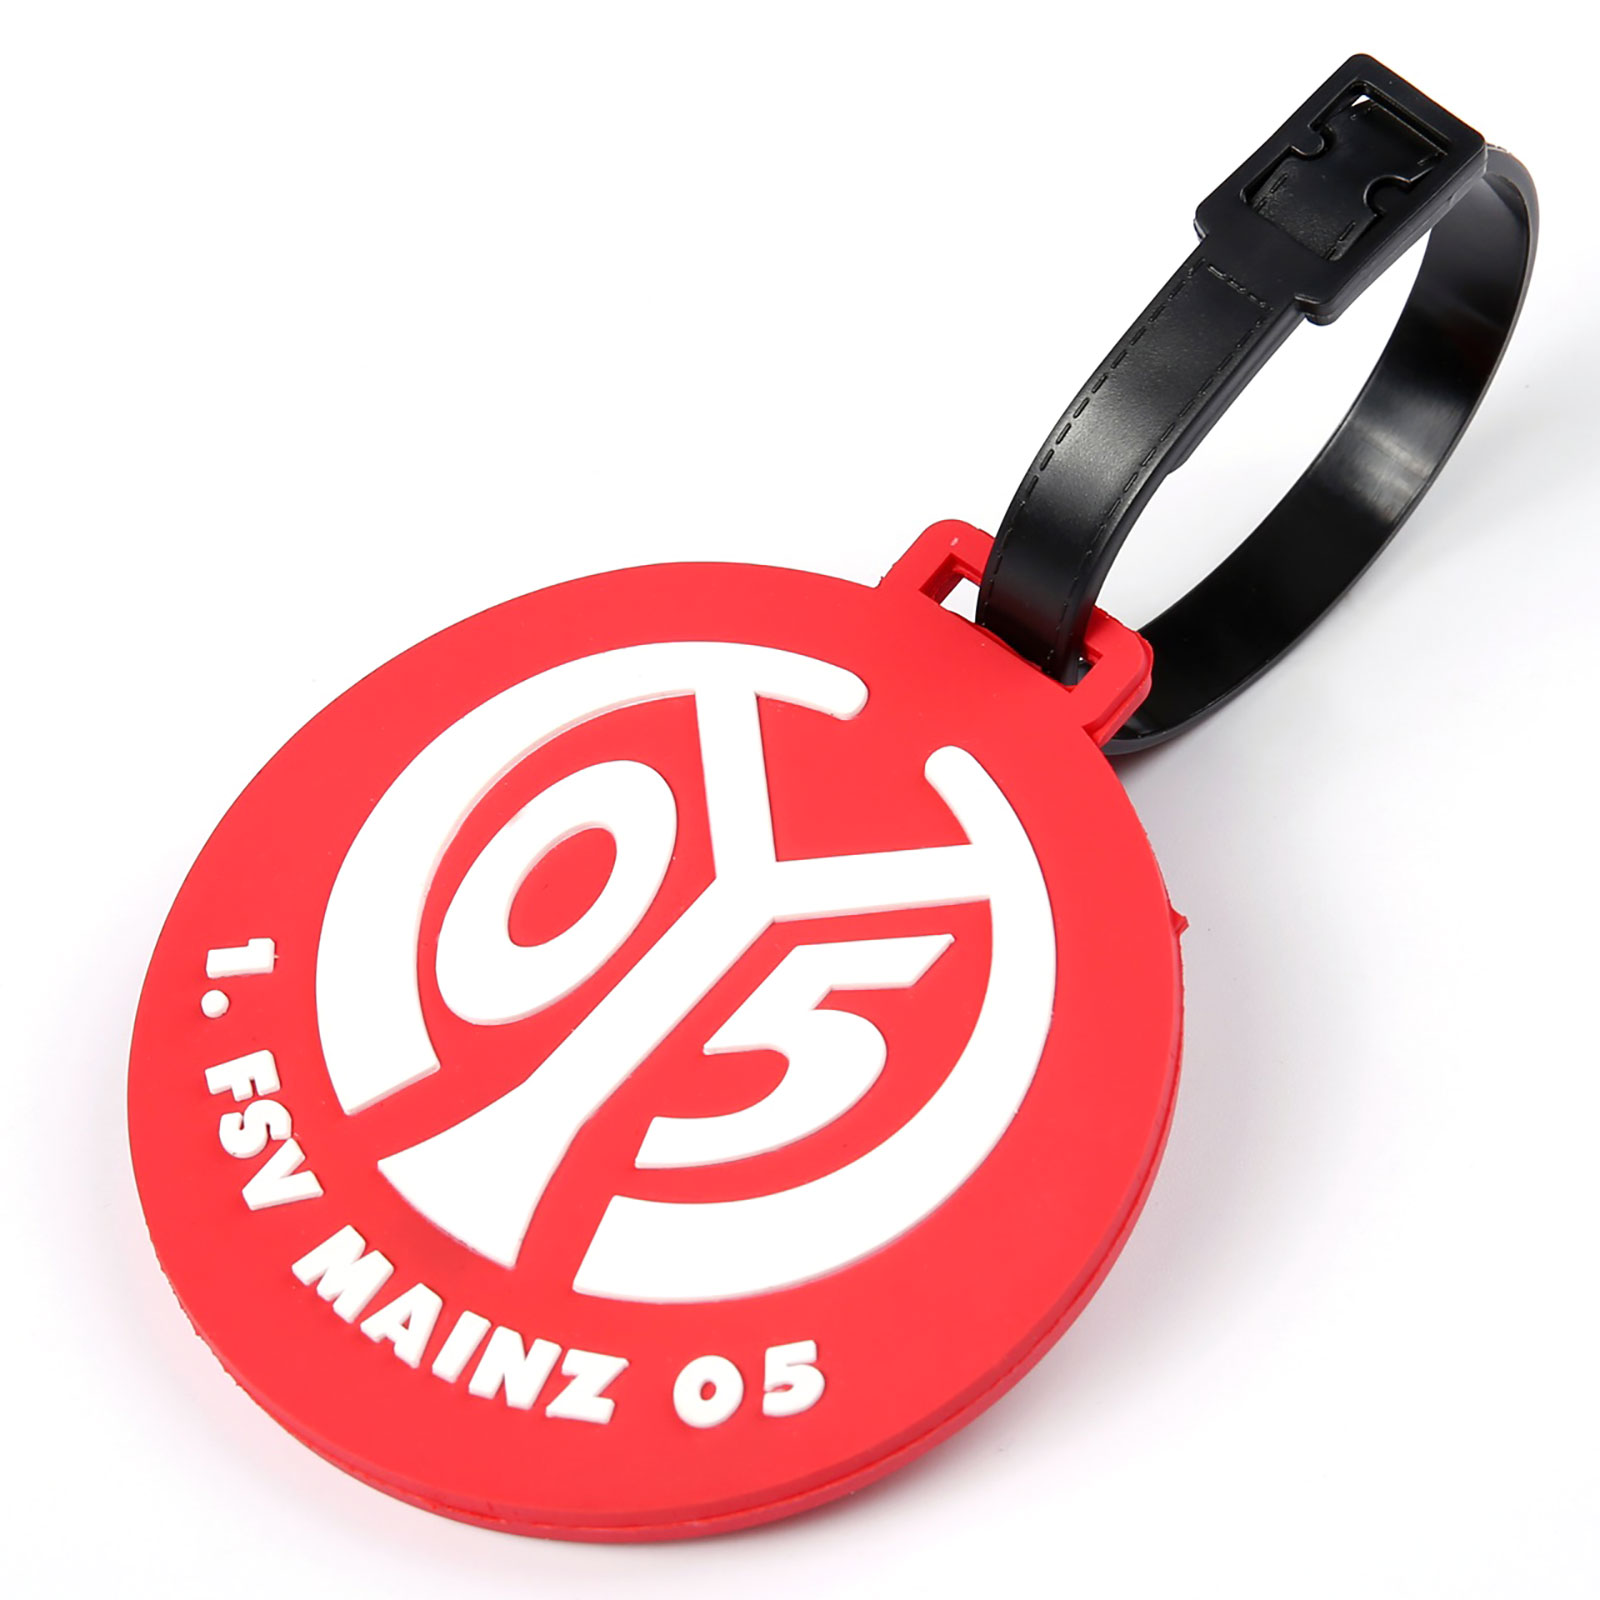 FSV Mainz 05 Kofferanhänger - Ca. 10 Cm 786008